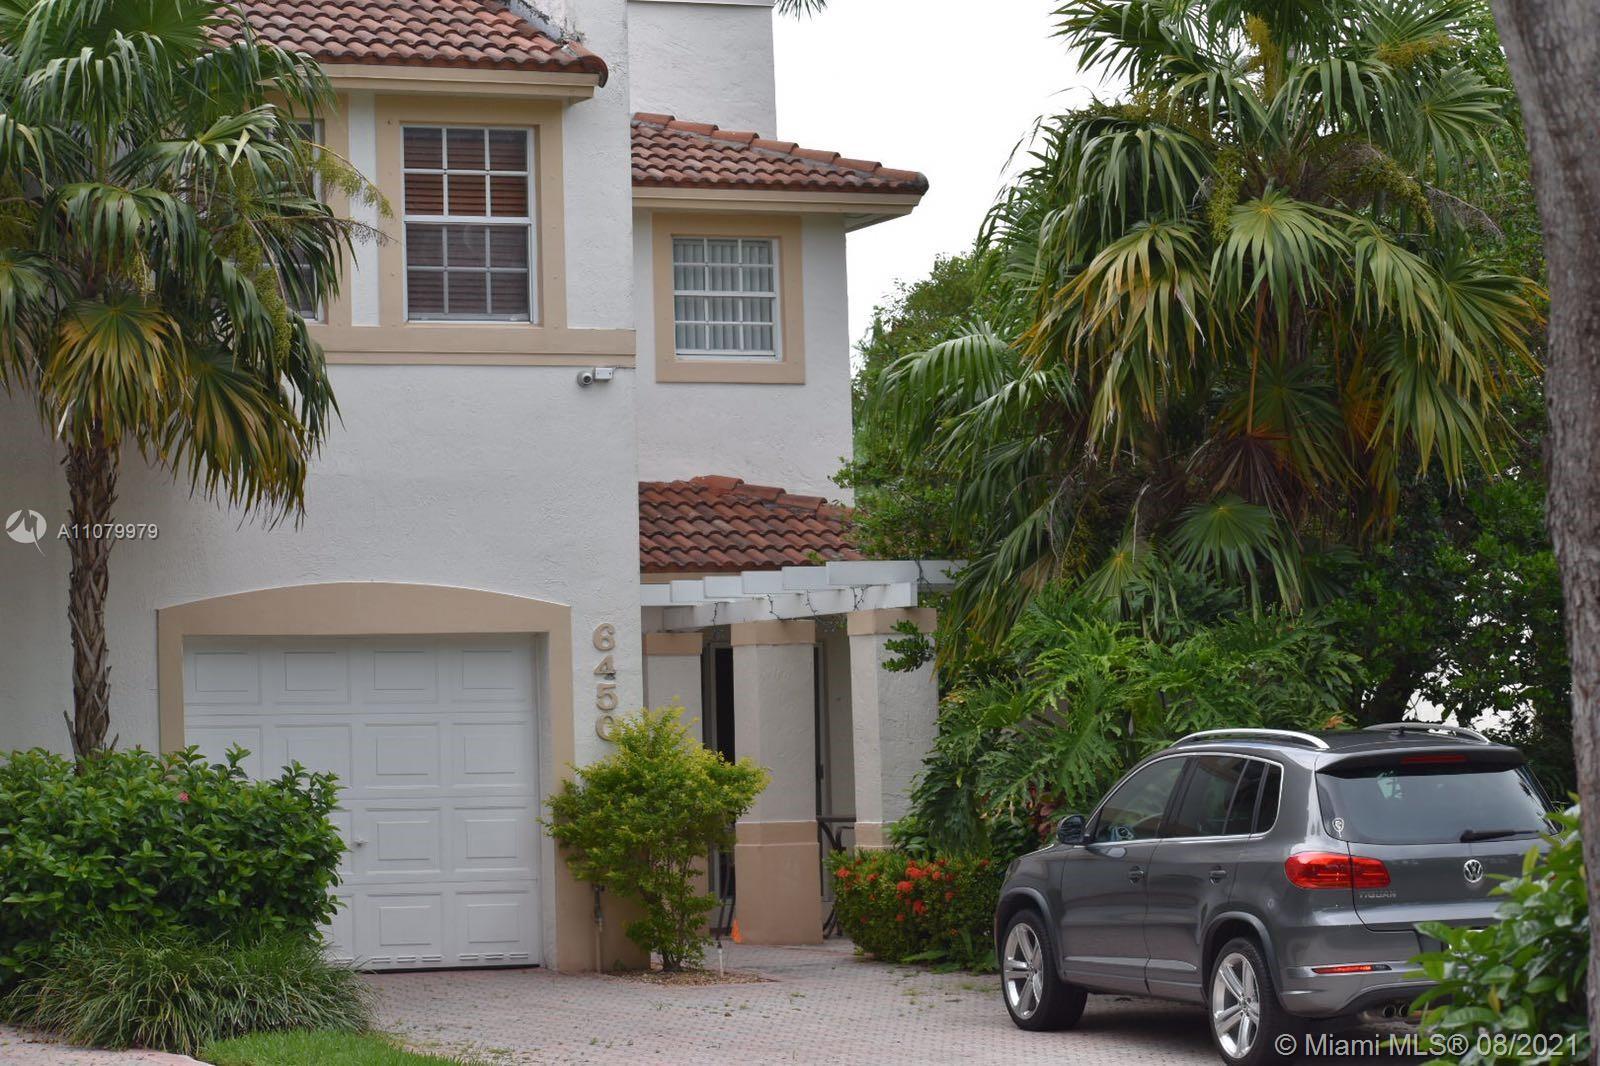 Doral Isles - 6450 NW 109th Ave, Doral, FL 33178